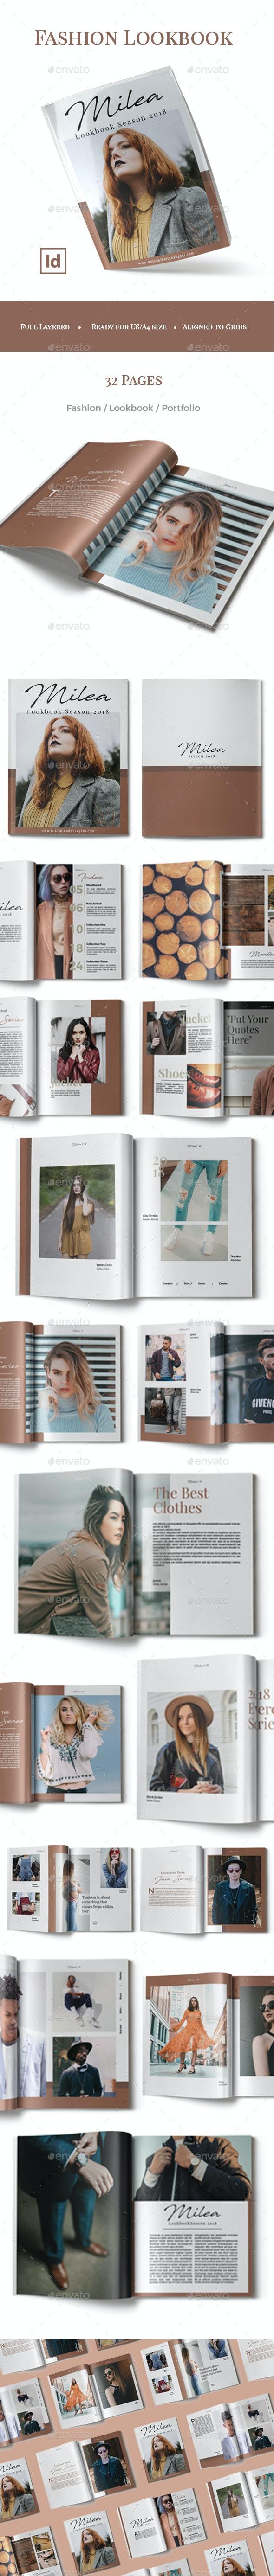 2018 Fashion Lookbook / Catalog - Magazines Print Templates